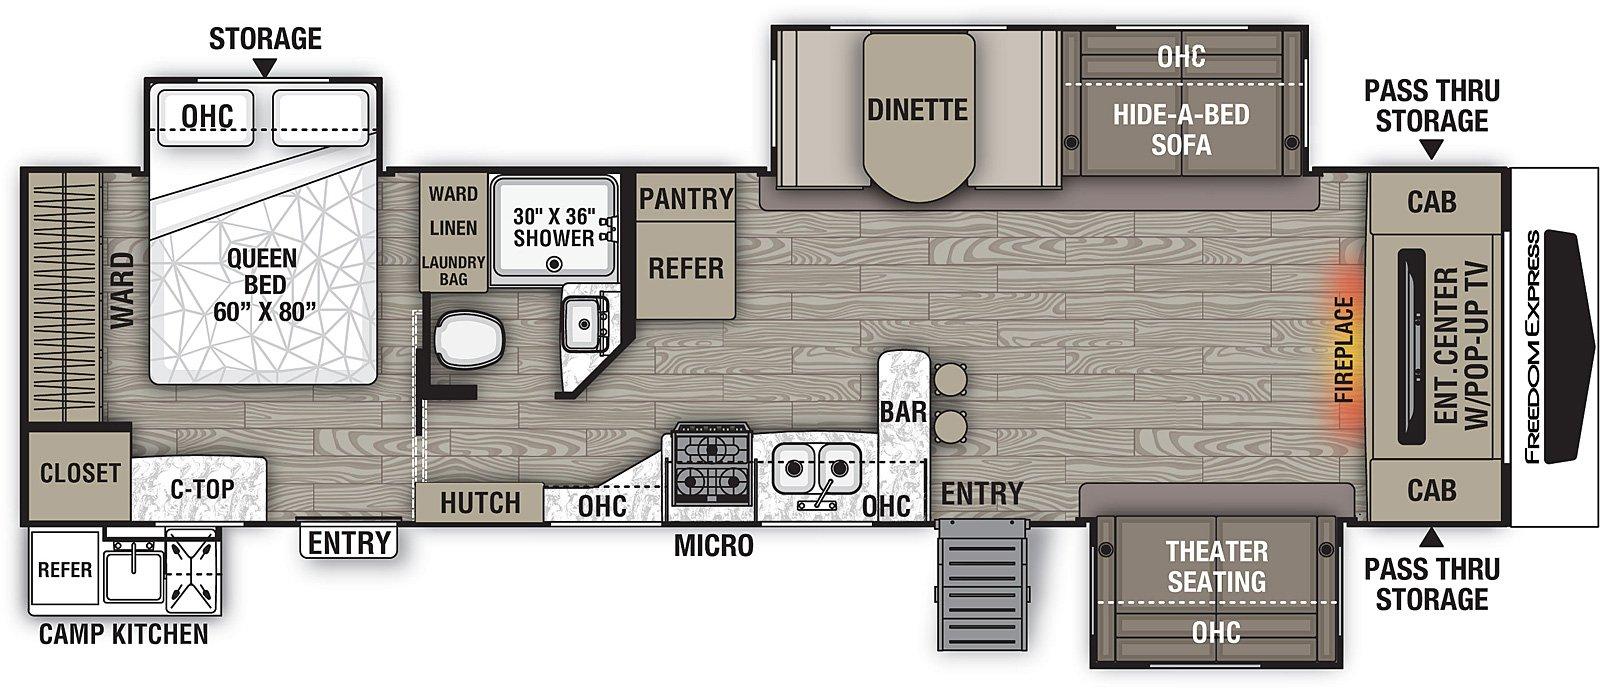 coachmen freedom express liberty edition 321fedsle rear bedroom floorplan